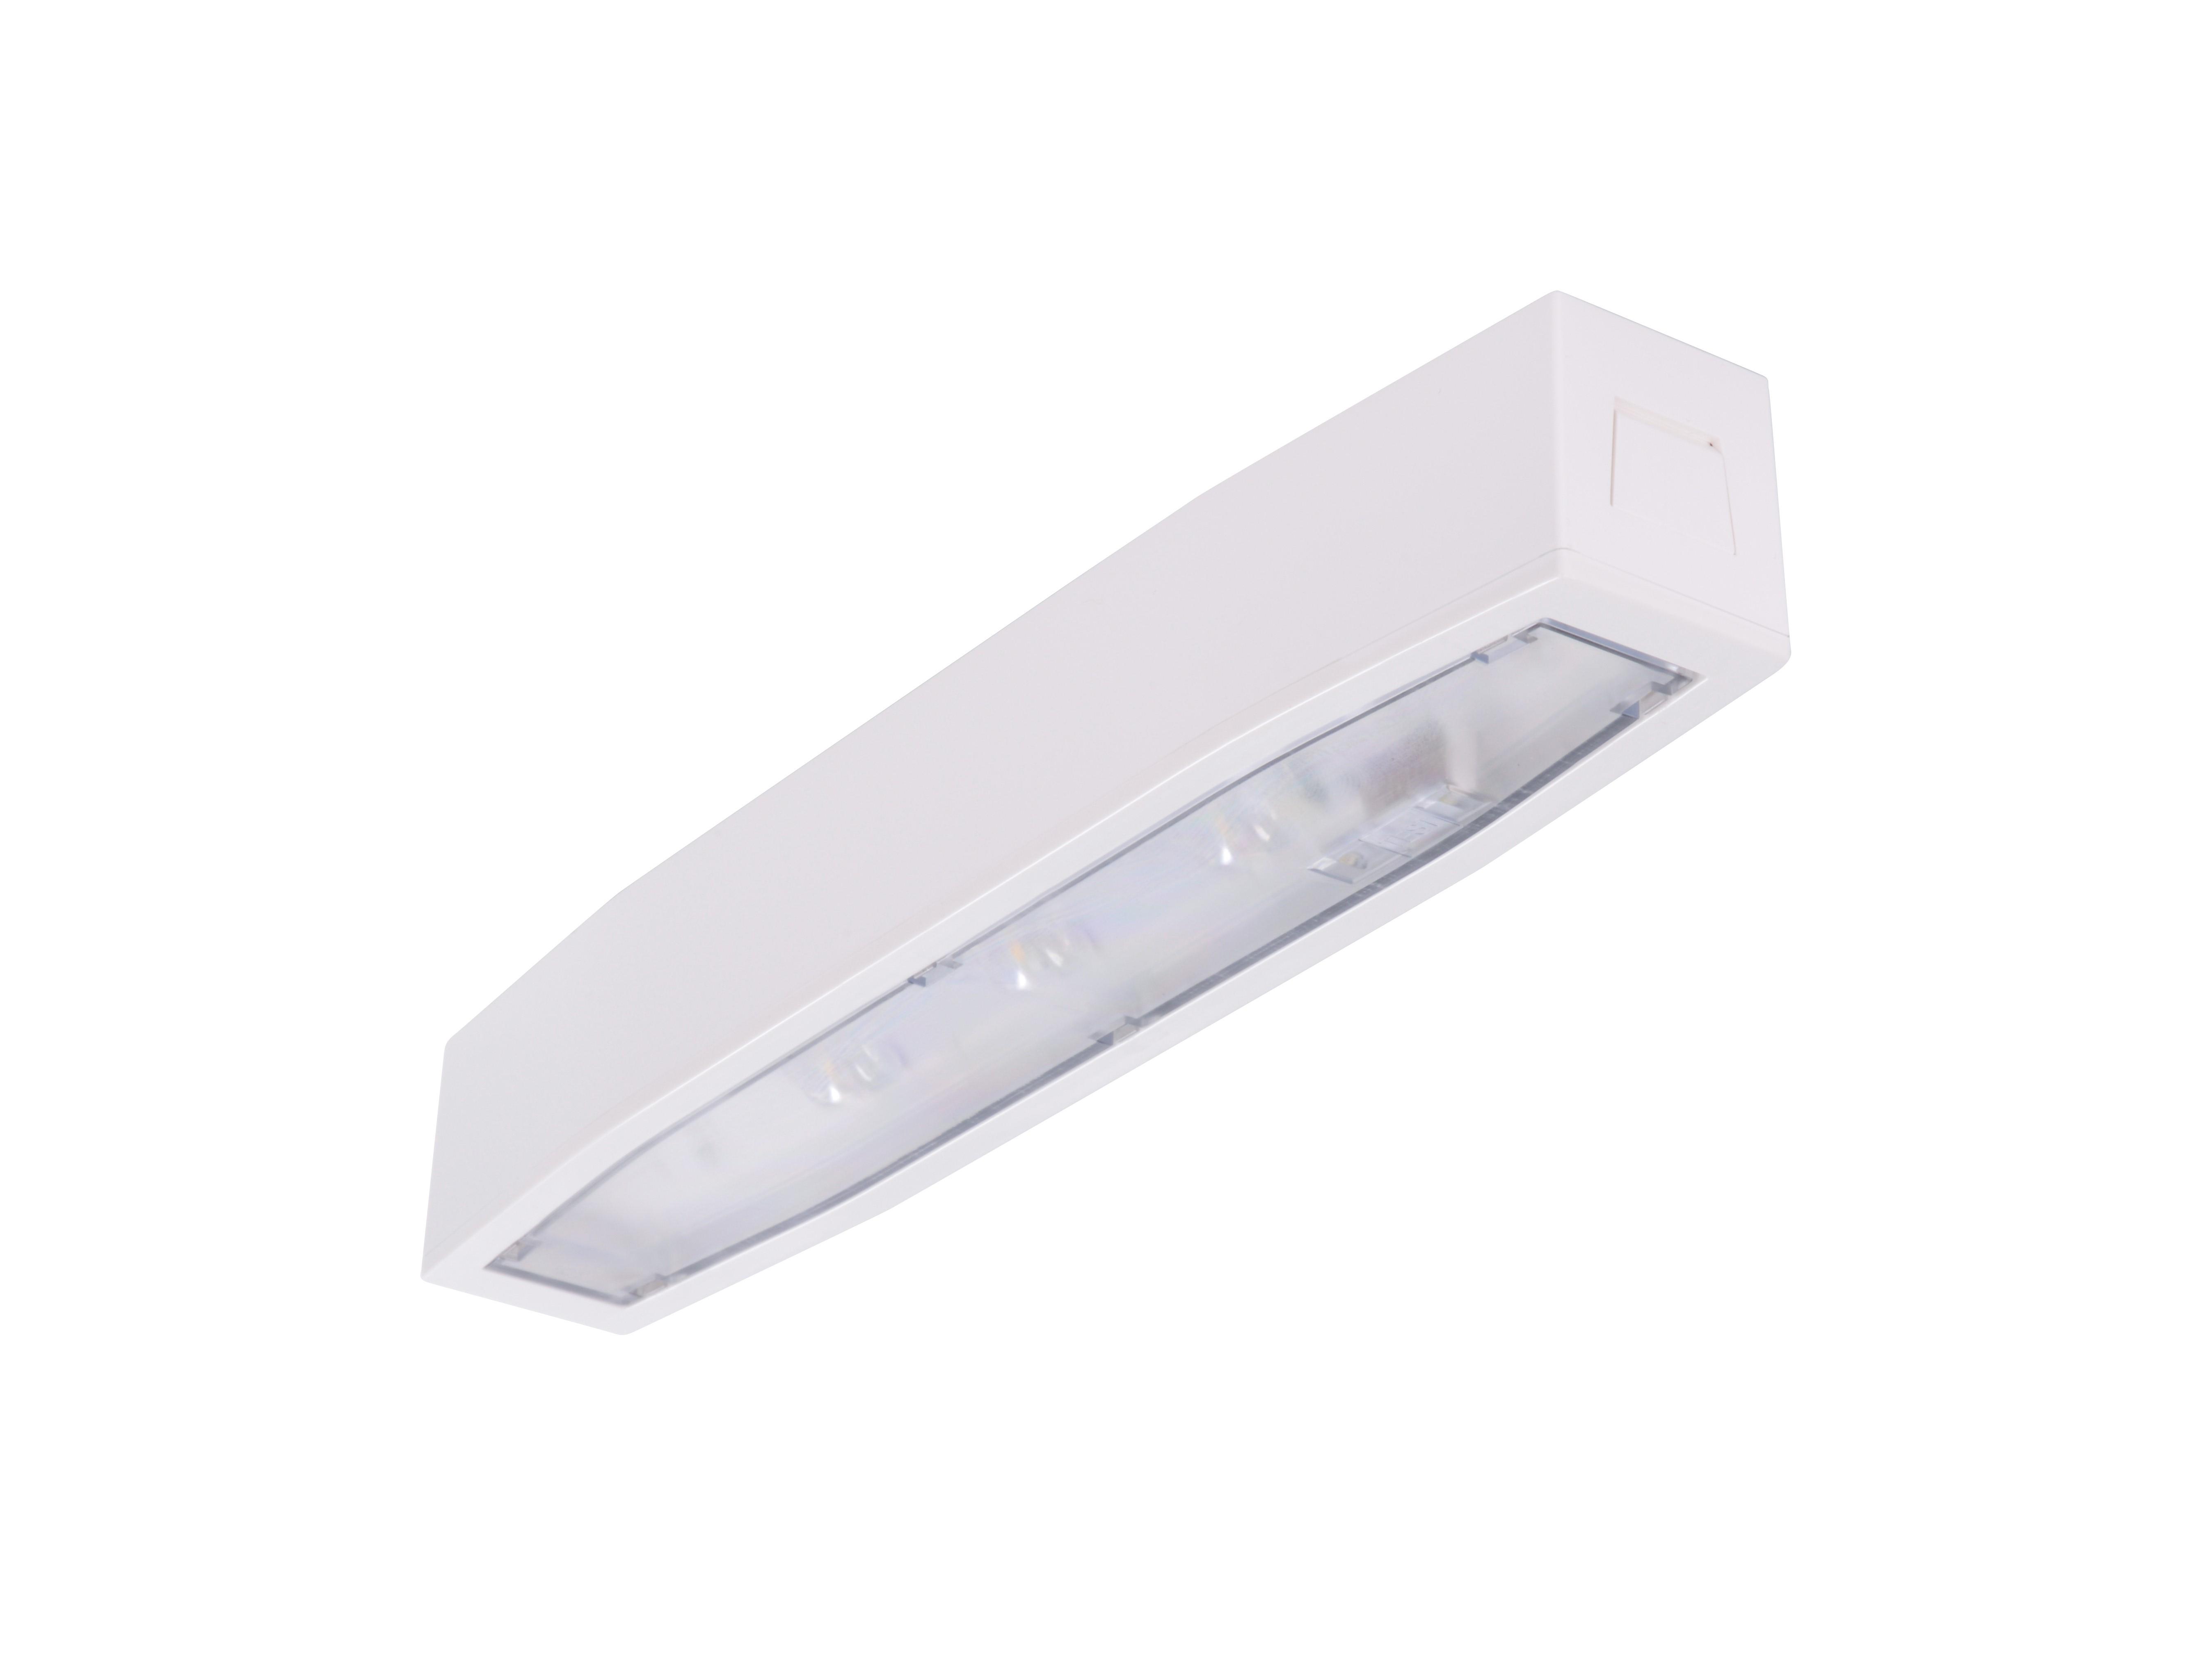 Lampa emergenta led Intelight 94702   3h mentinut test automat 0